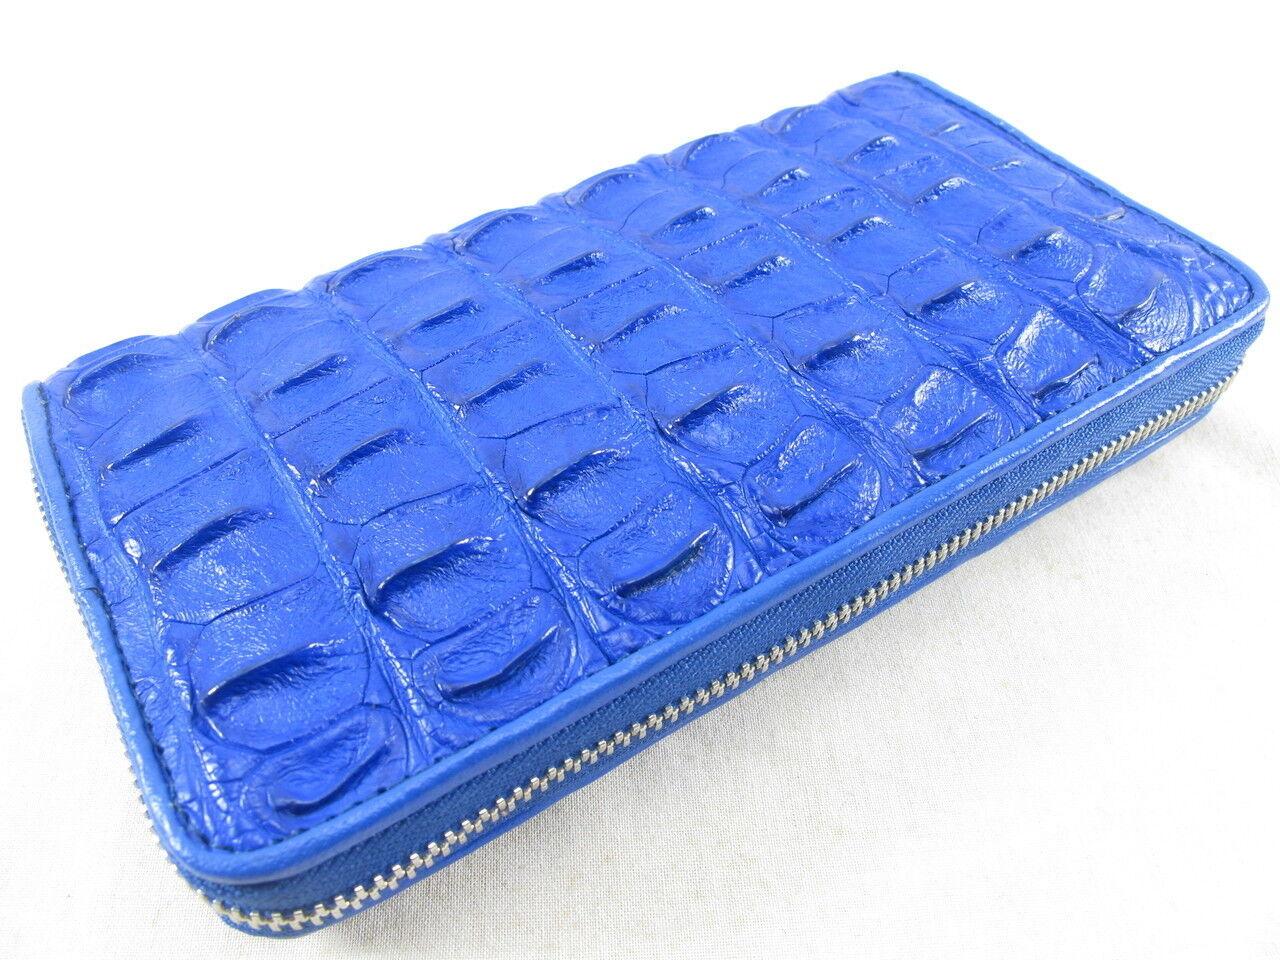 PELGIO Genuine Crocodile Backbone Skin Leather Zip Around Clutch Wallet Blue